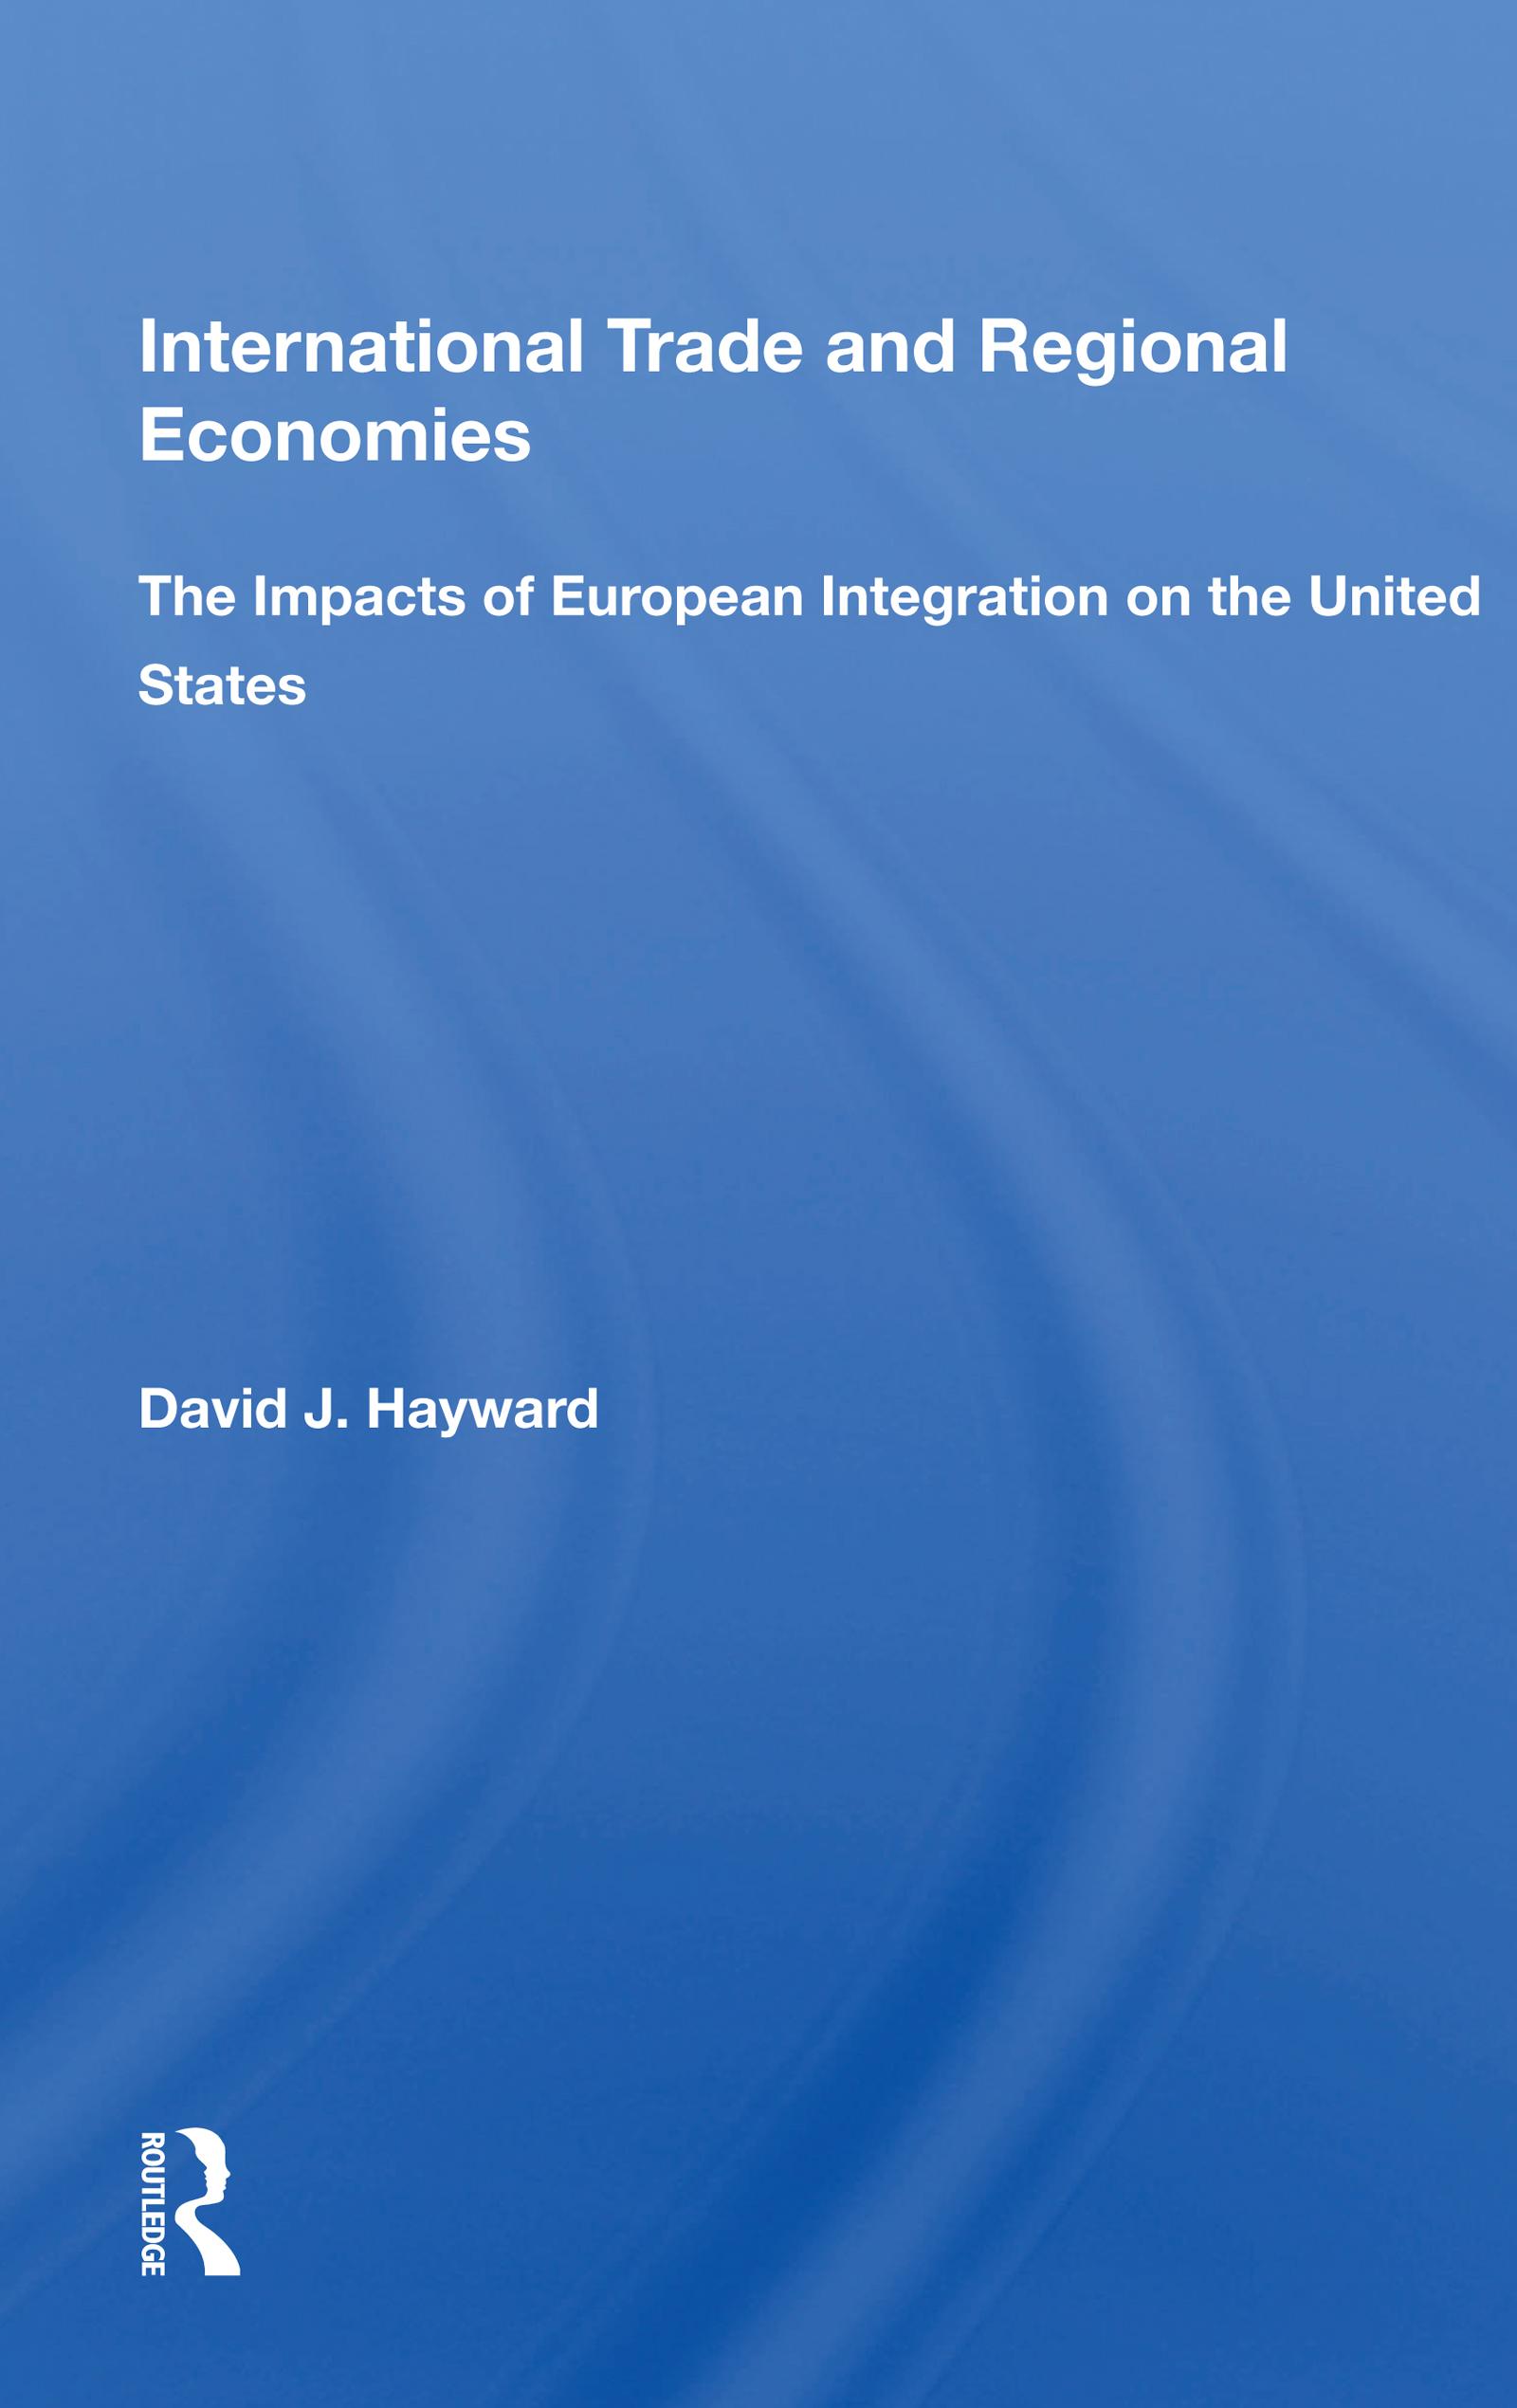 International Trade and Regional Economies